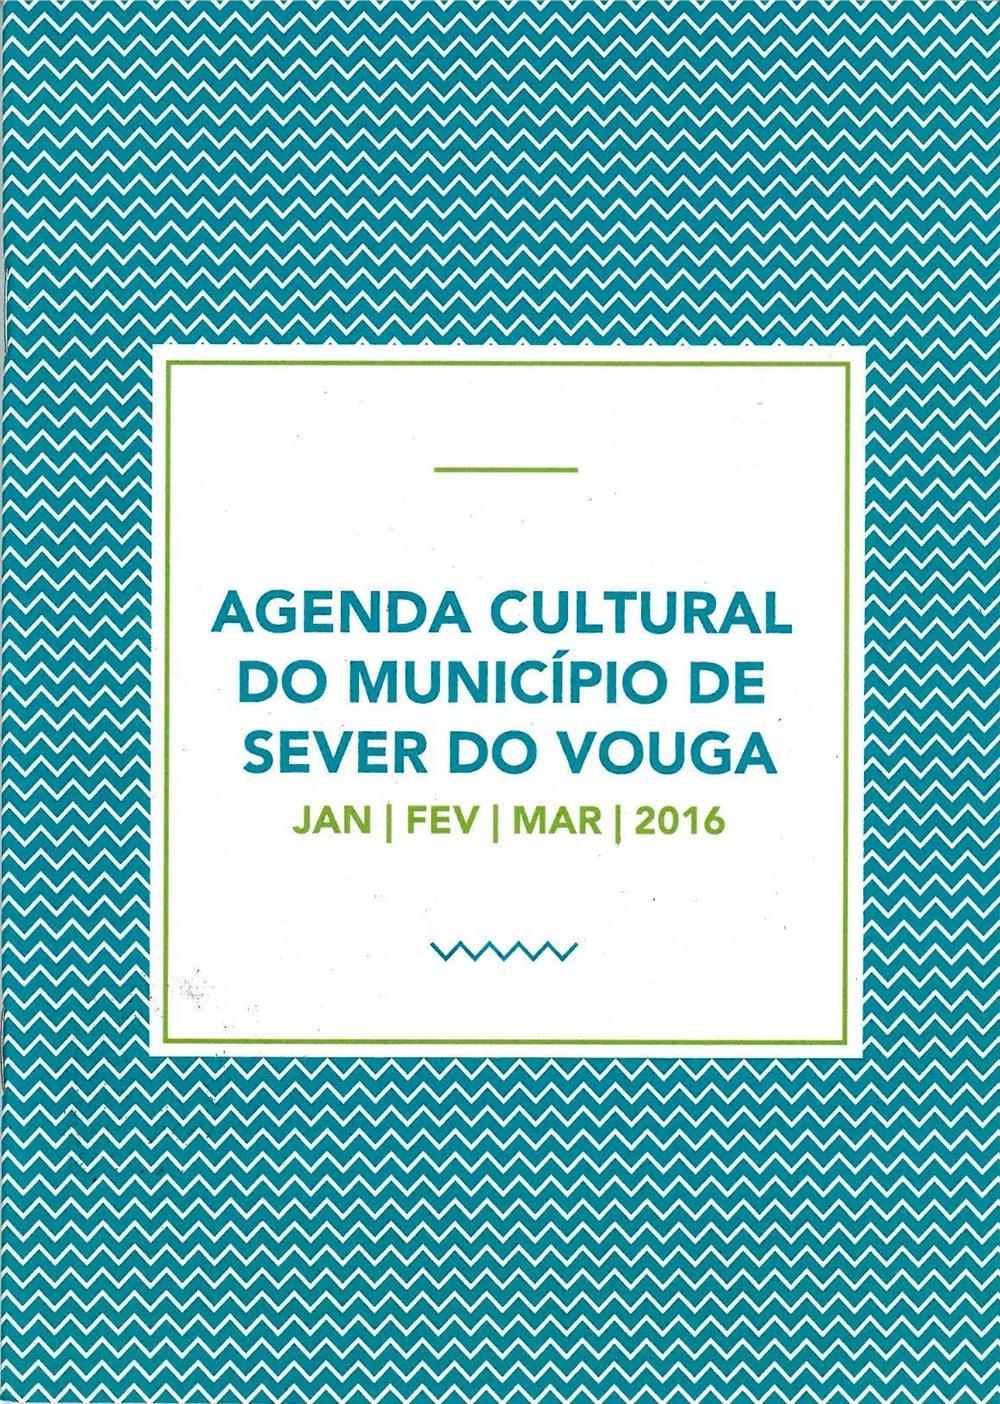 ACMSV-jan.,fev.,mar.'16-capa-Agenda Cultural do Município de Sever do Vouga.jpg